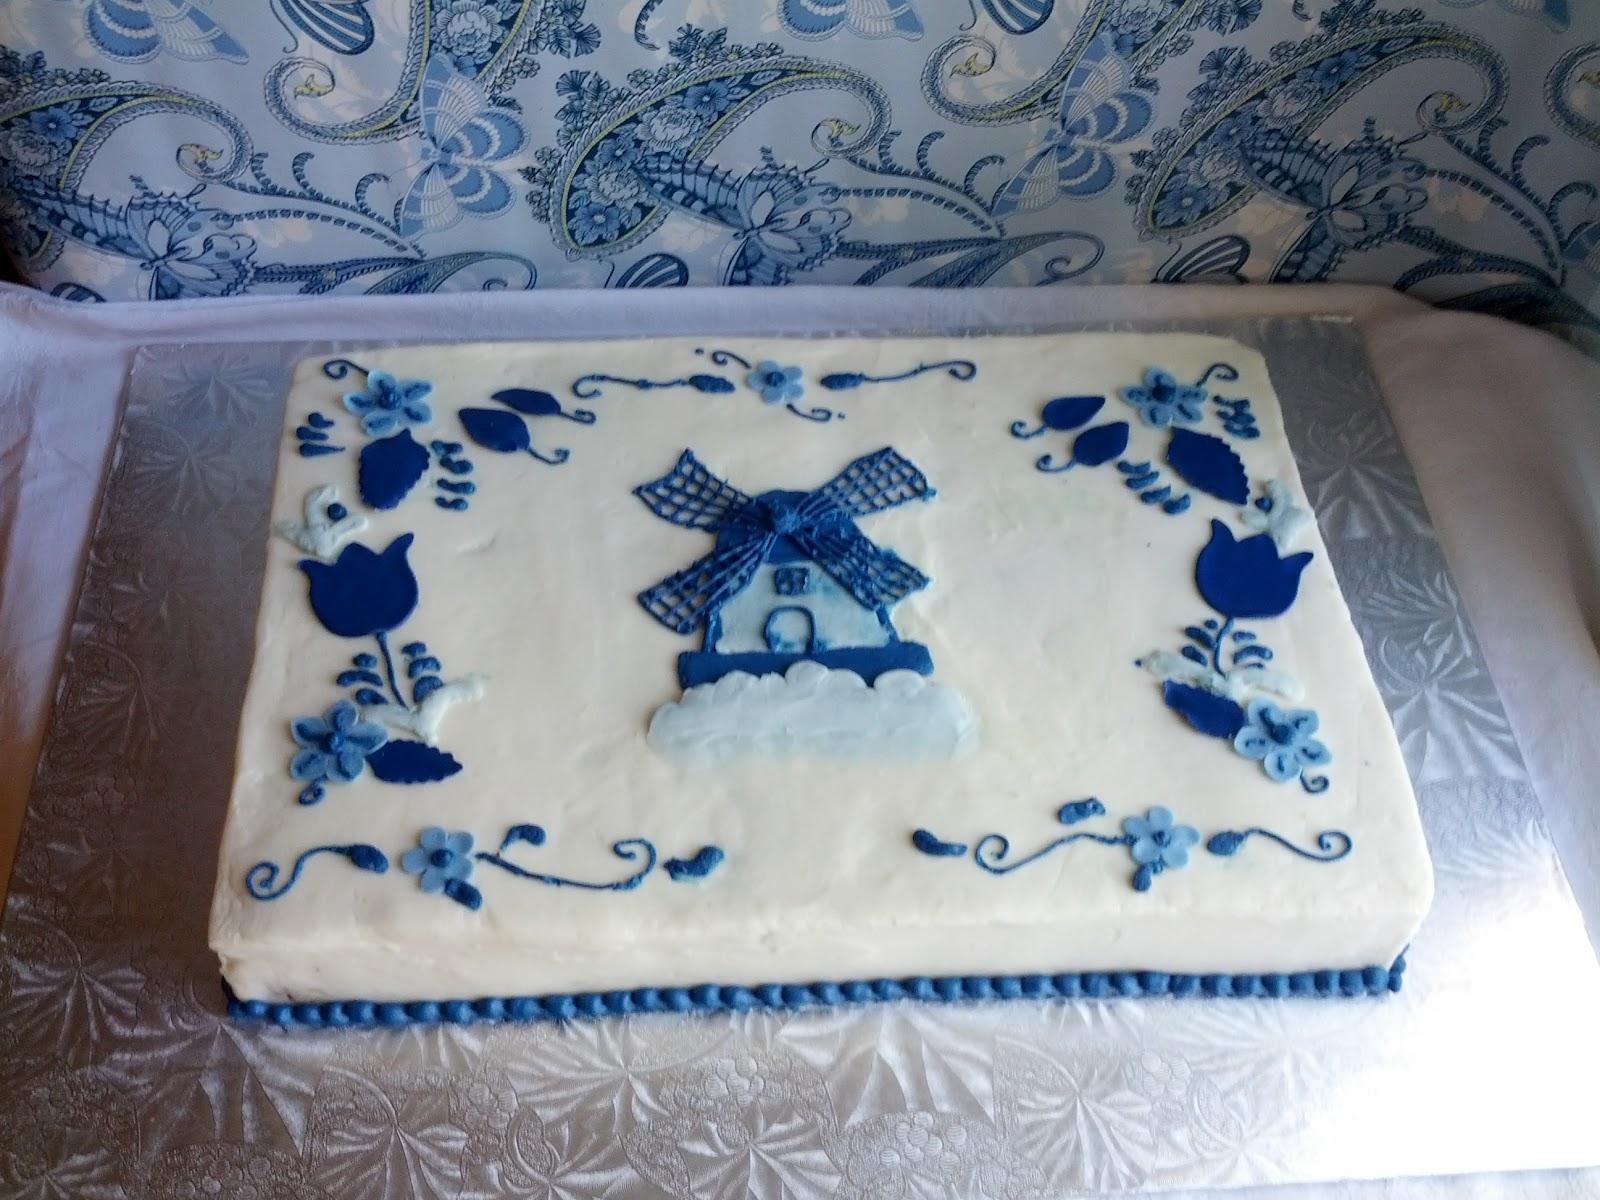 Second Generation Cake Design Delft Blue Dutch Birthday Cake